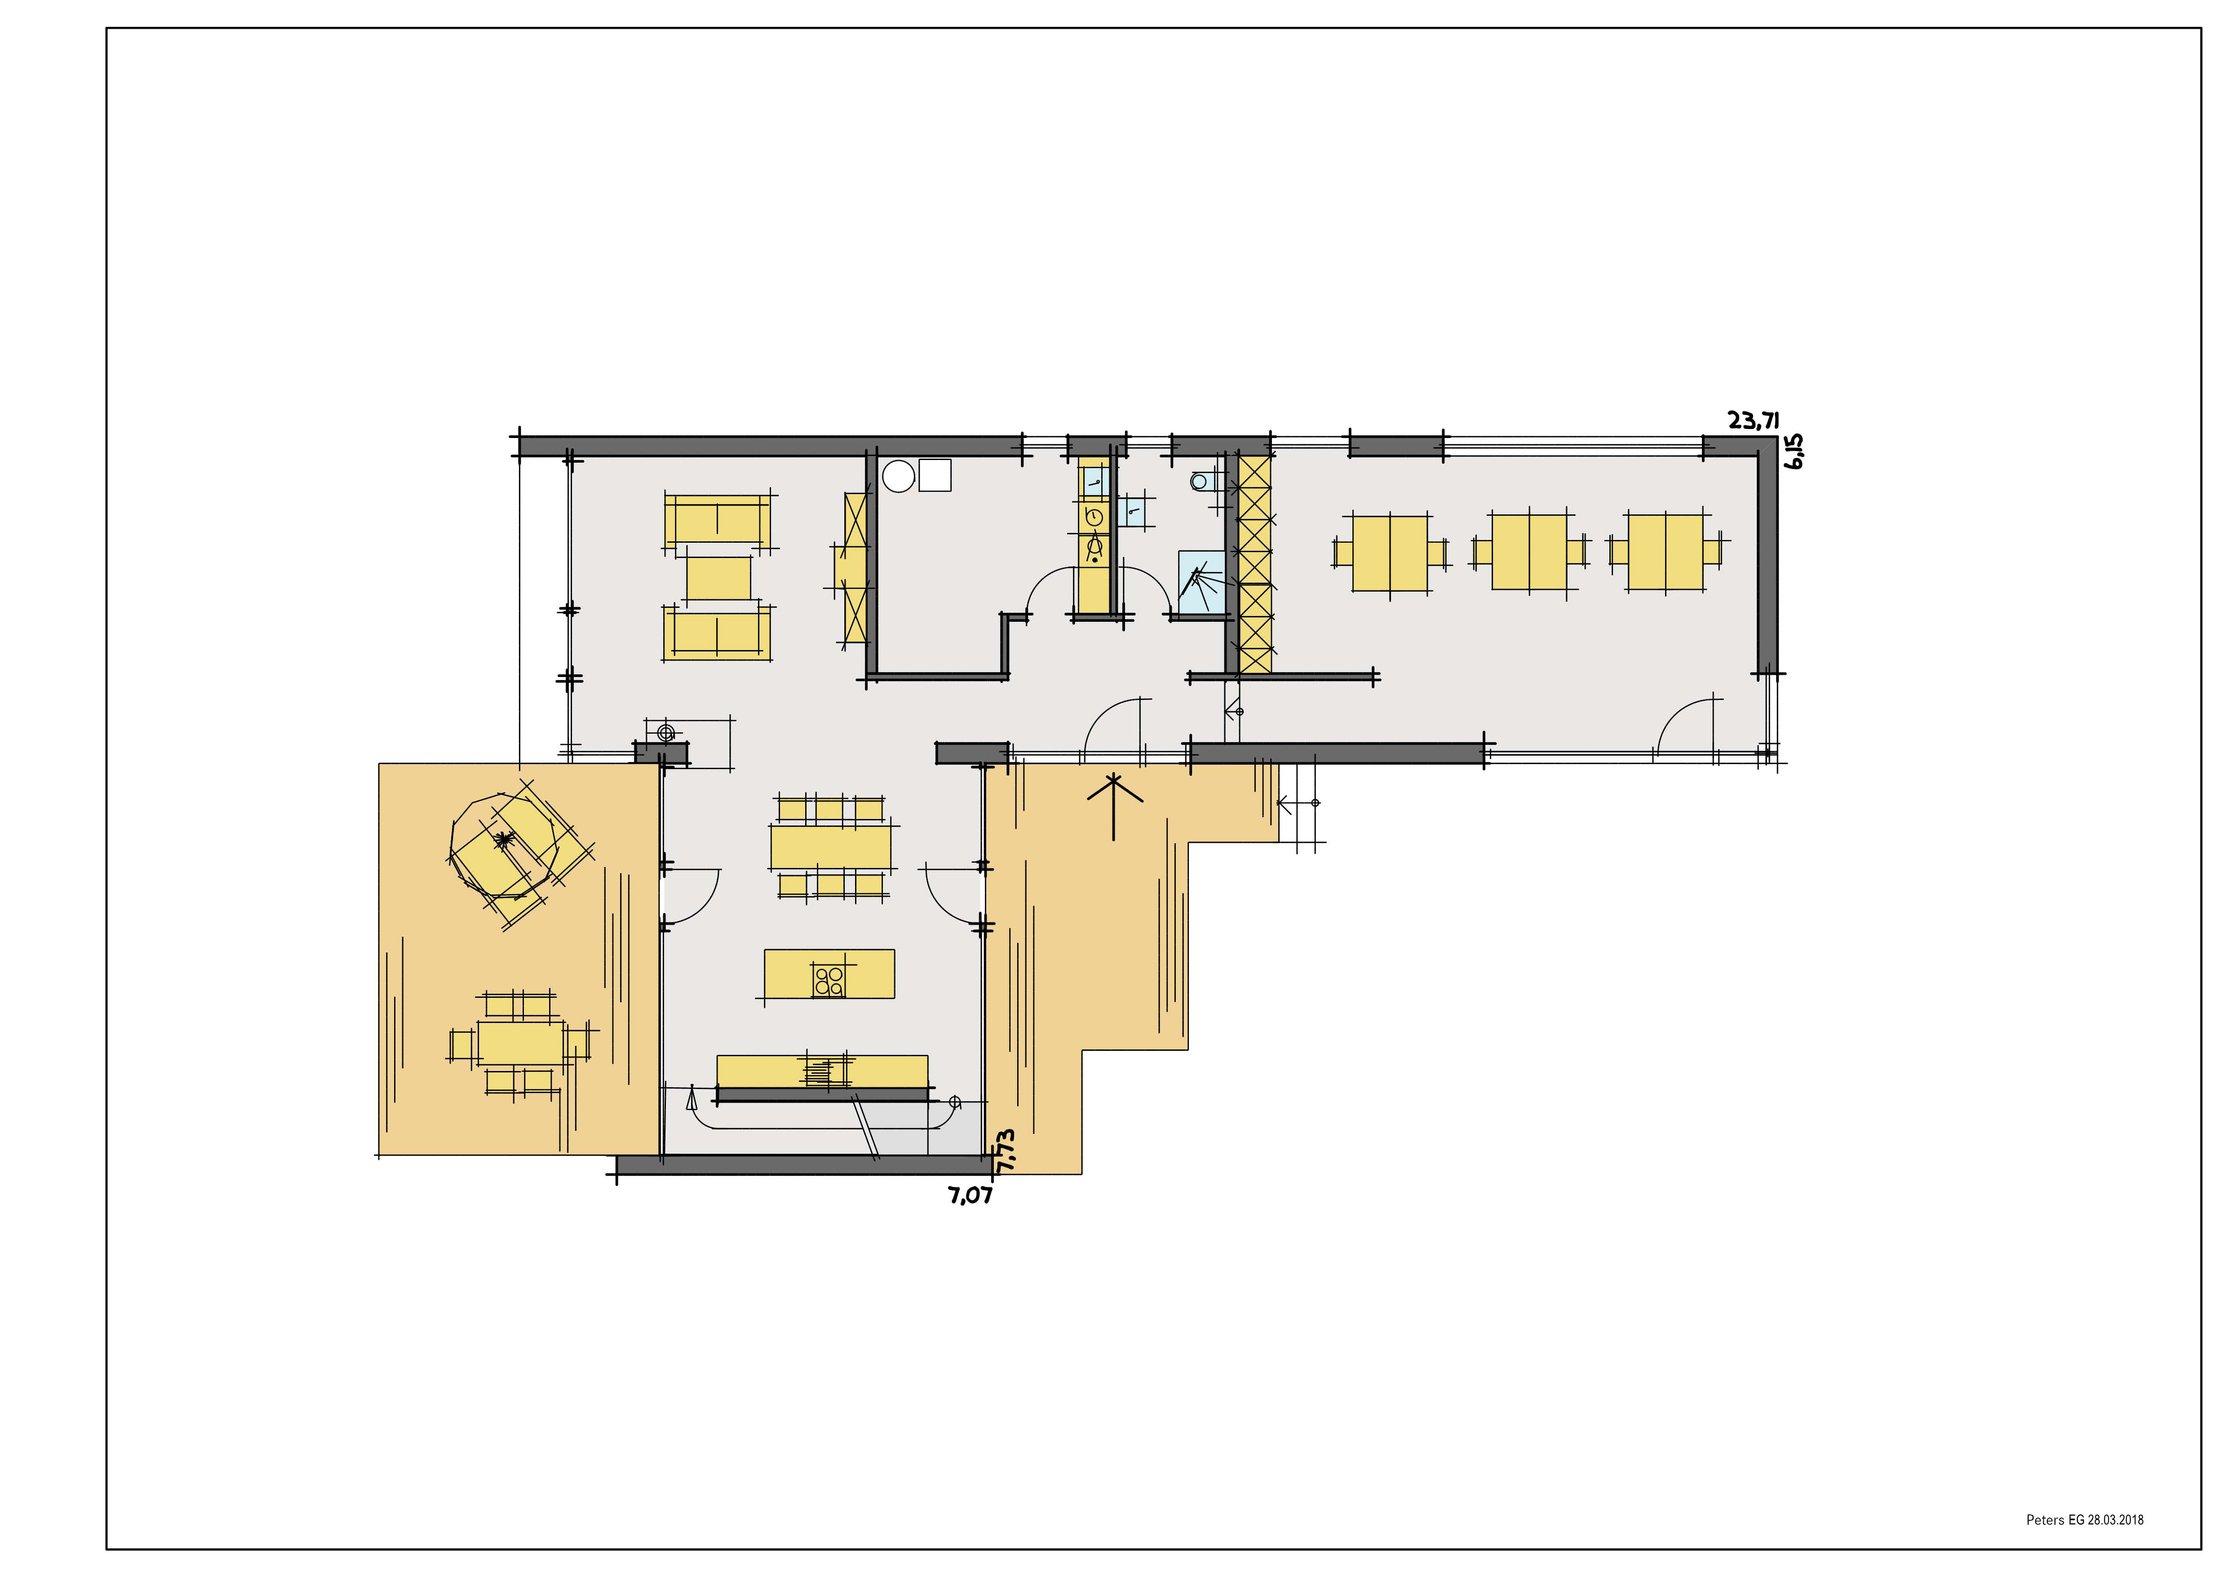 Copic-Grundriss EG Haus Peters